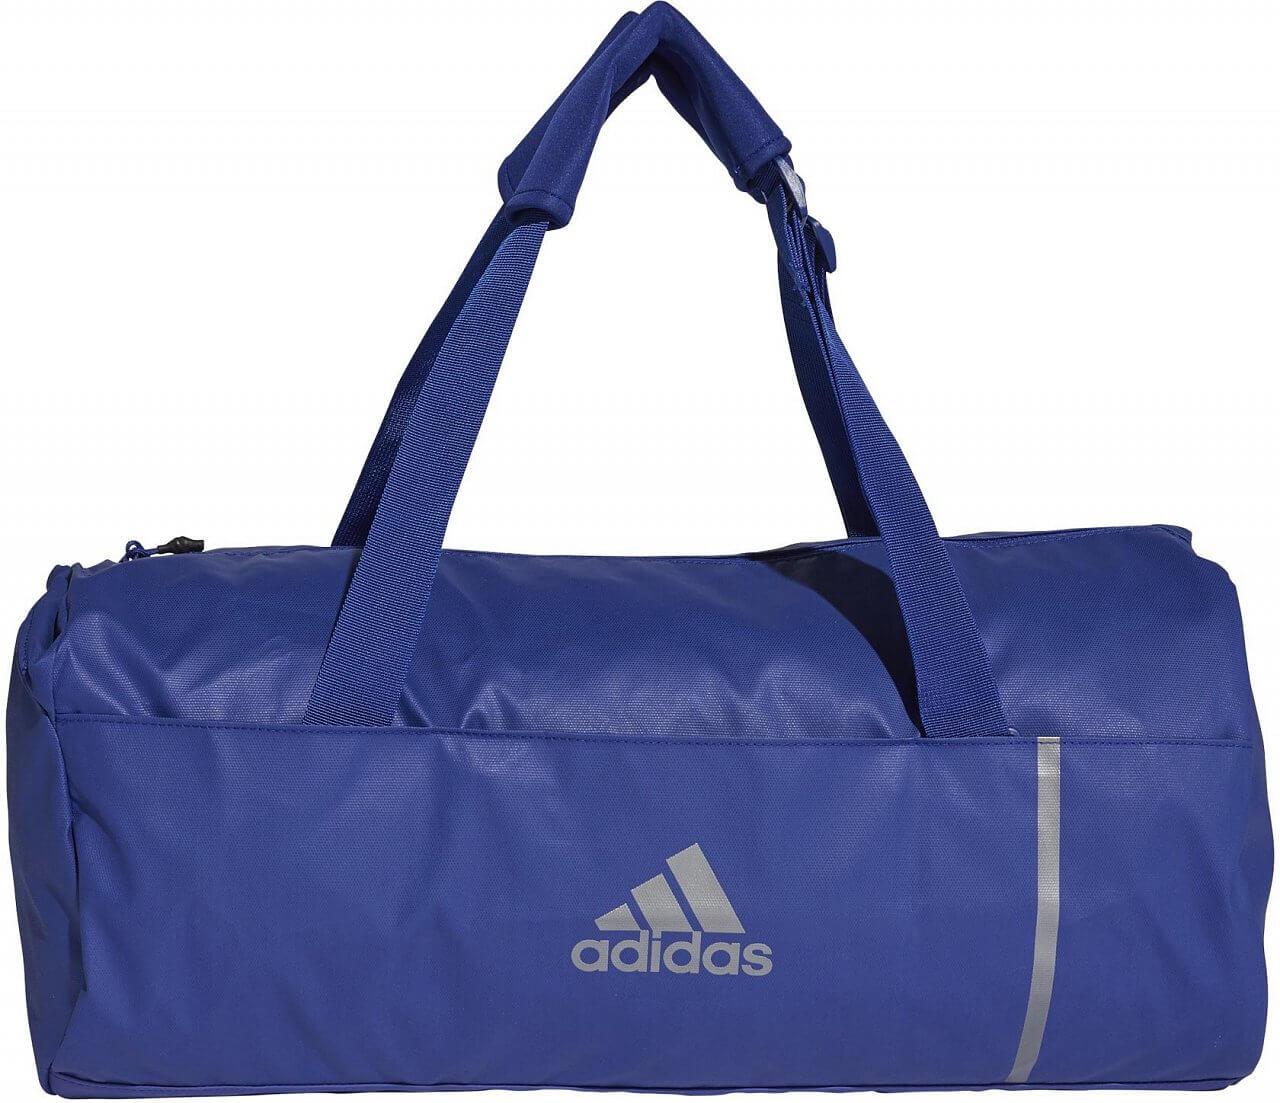 Sportovní taška adidas Convertible Training Duffel Bag M